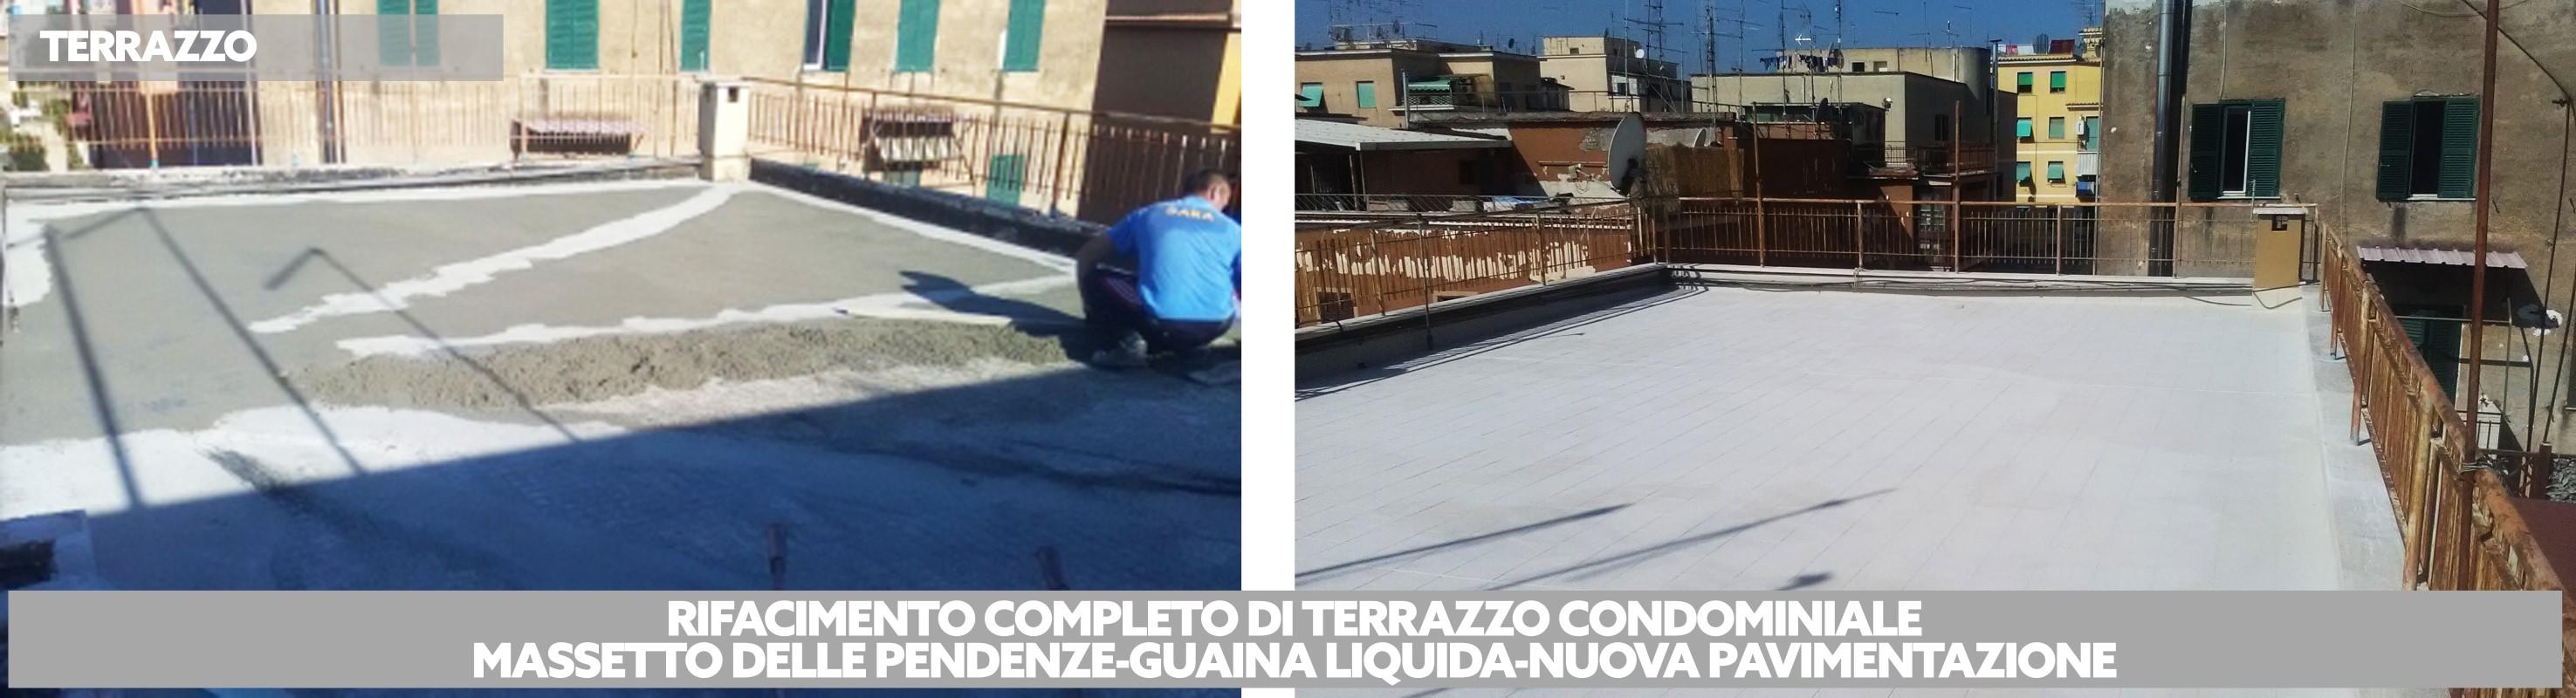 Rifacimento tetto condominiale Roma